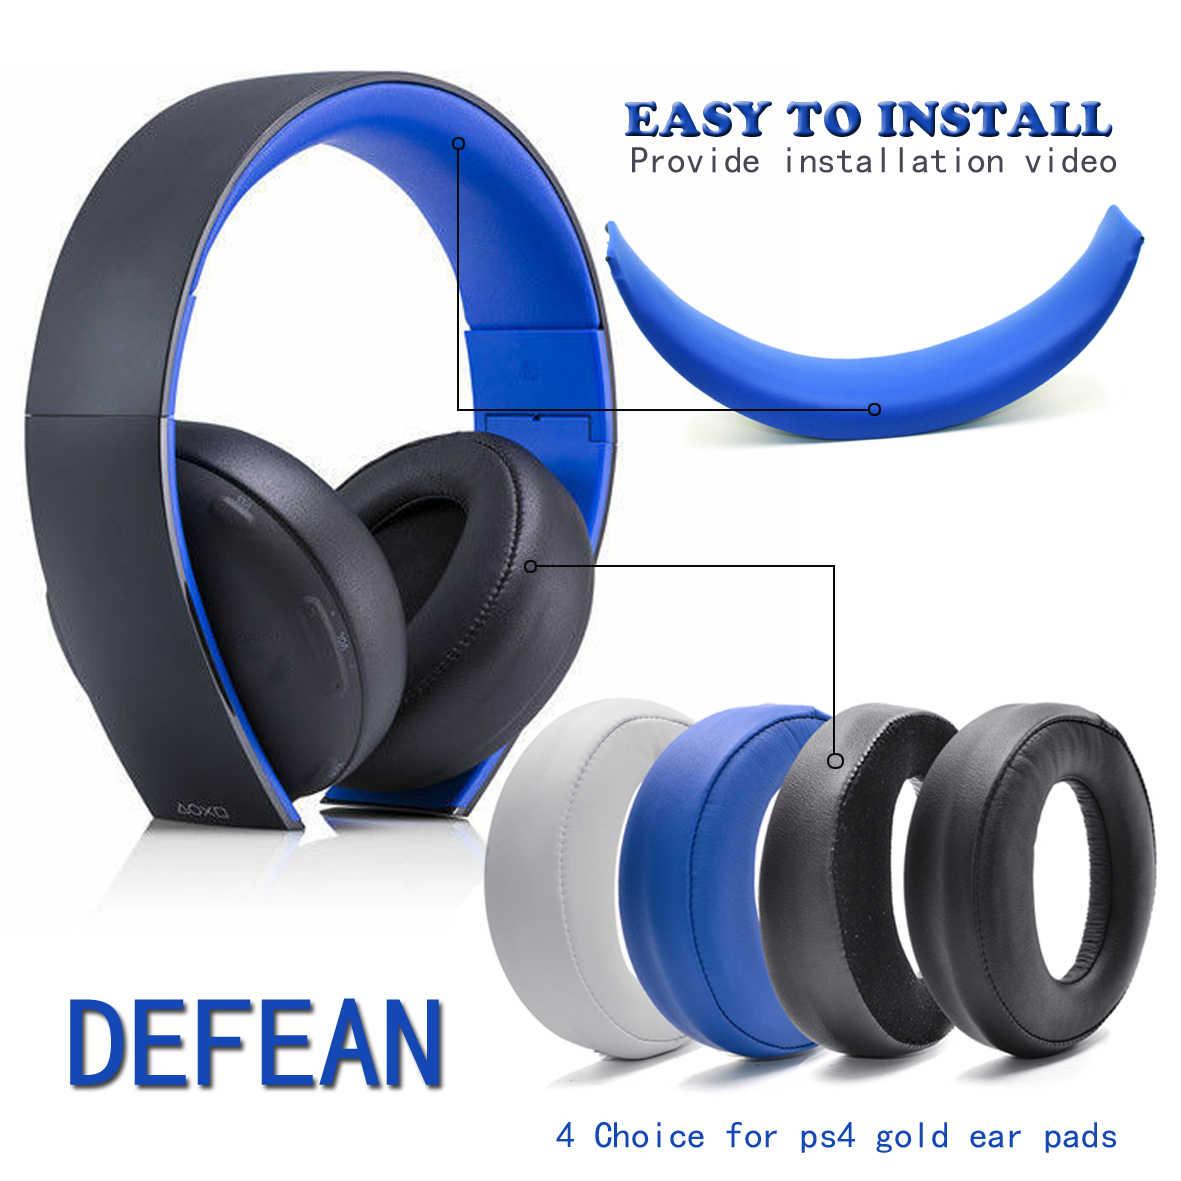 Bgworld Replacement Upgrade Headband Earpads For Sony Gold Wireless Headset Ps3 Ps4 7 1 Cechya 0083 Headphone Aliexpress